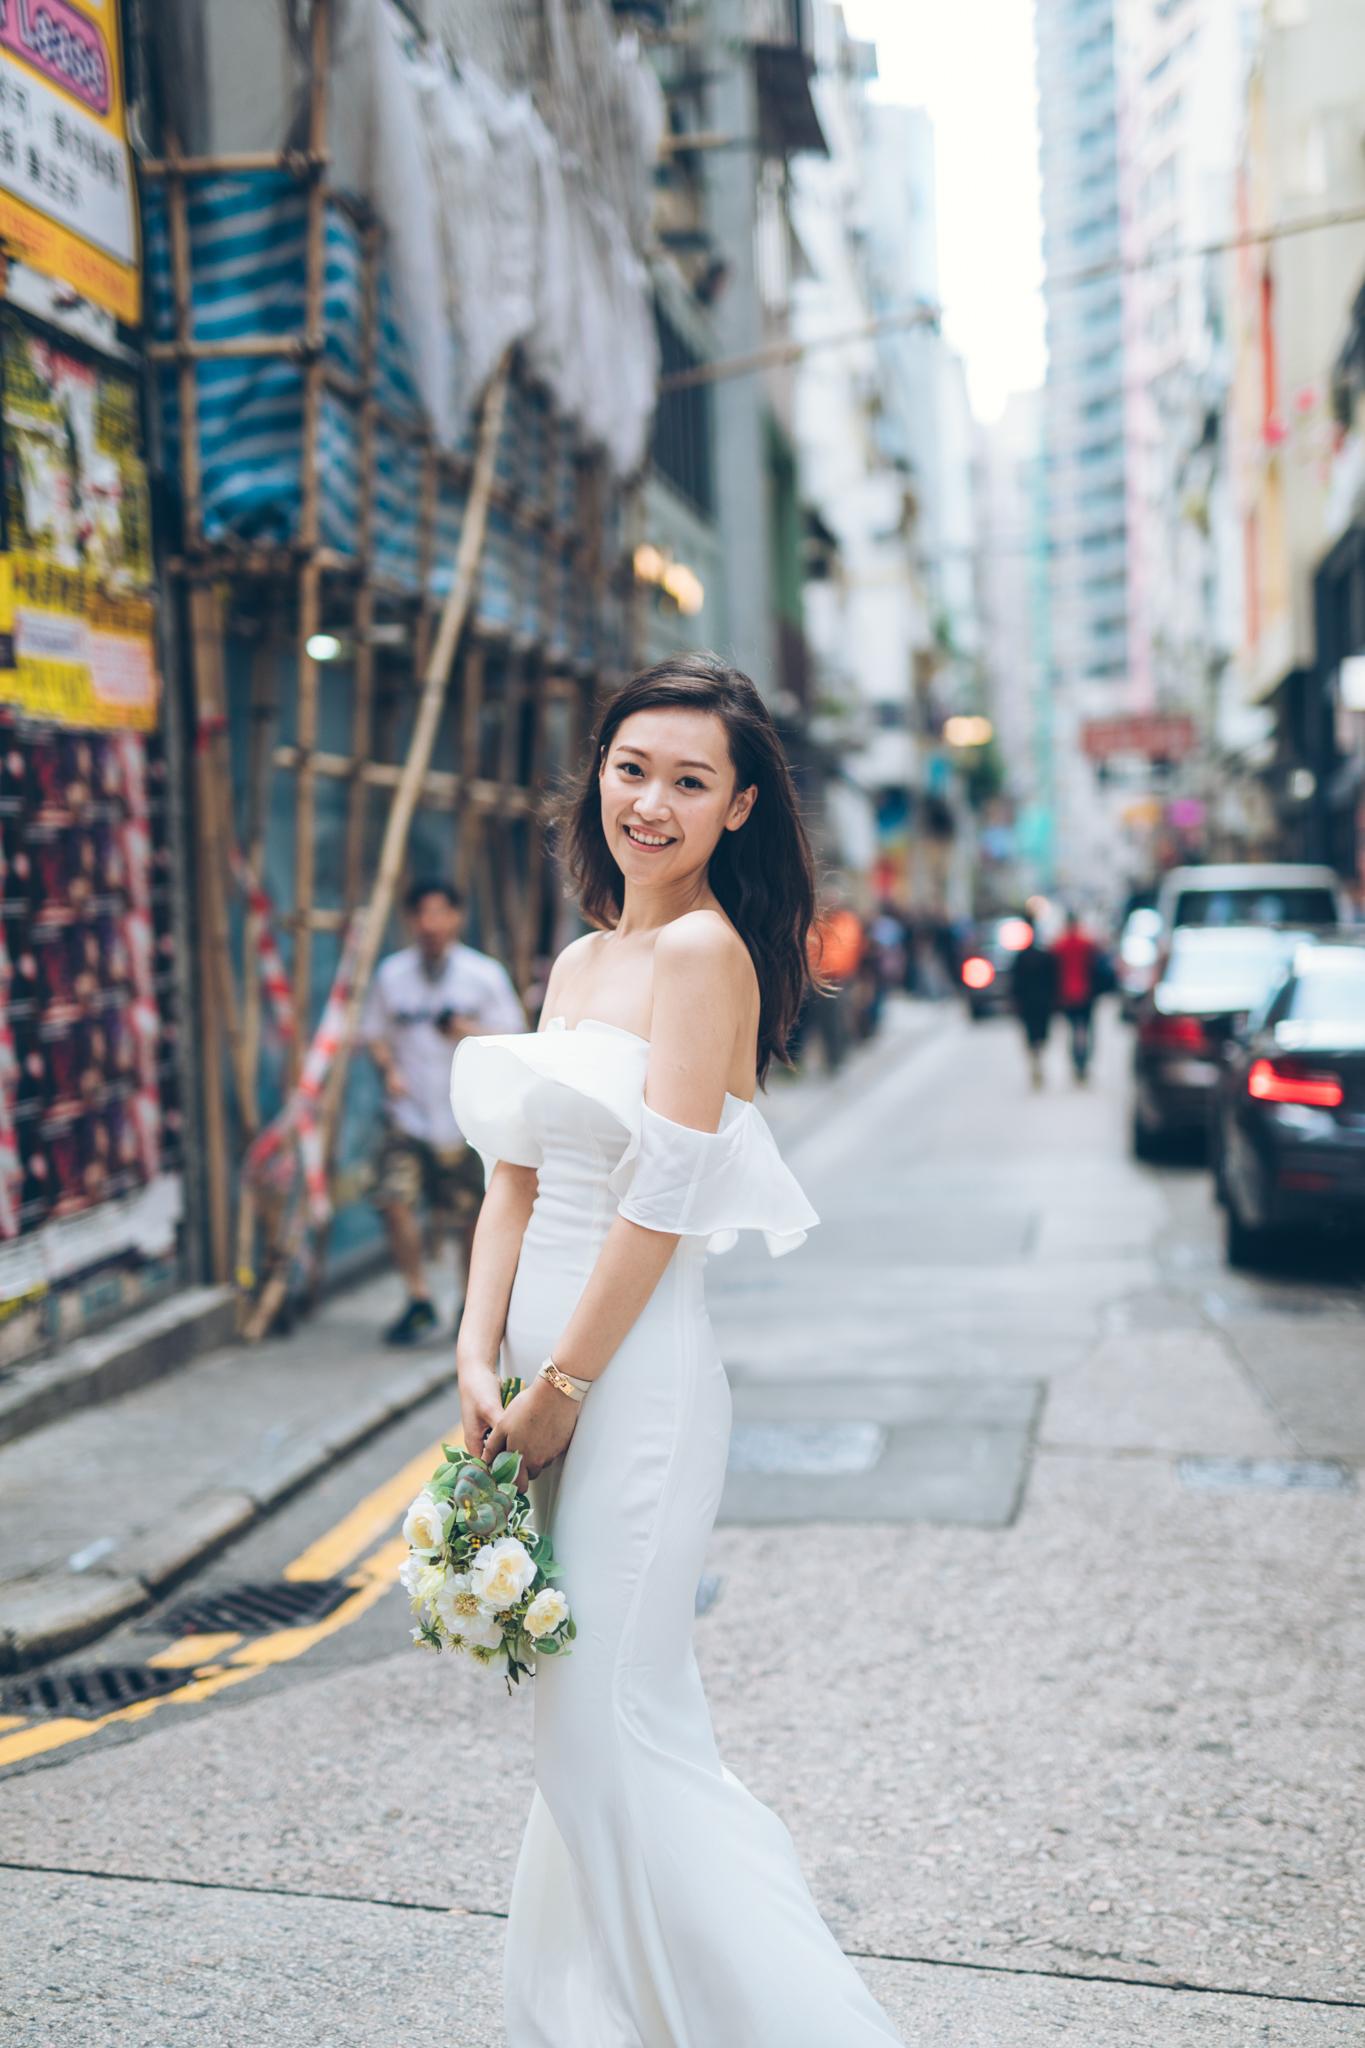 Model Factory Hong Kong Female Model VickiT